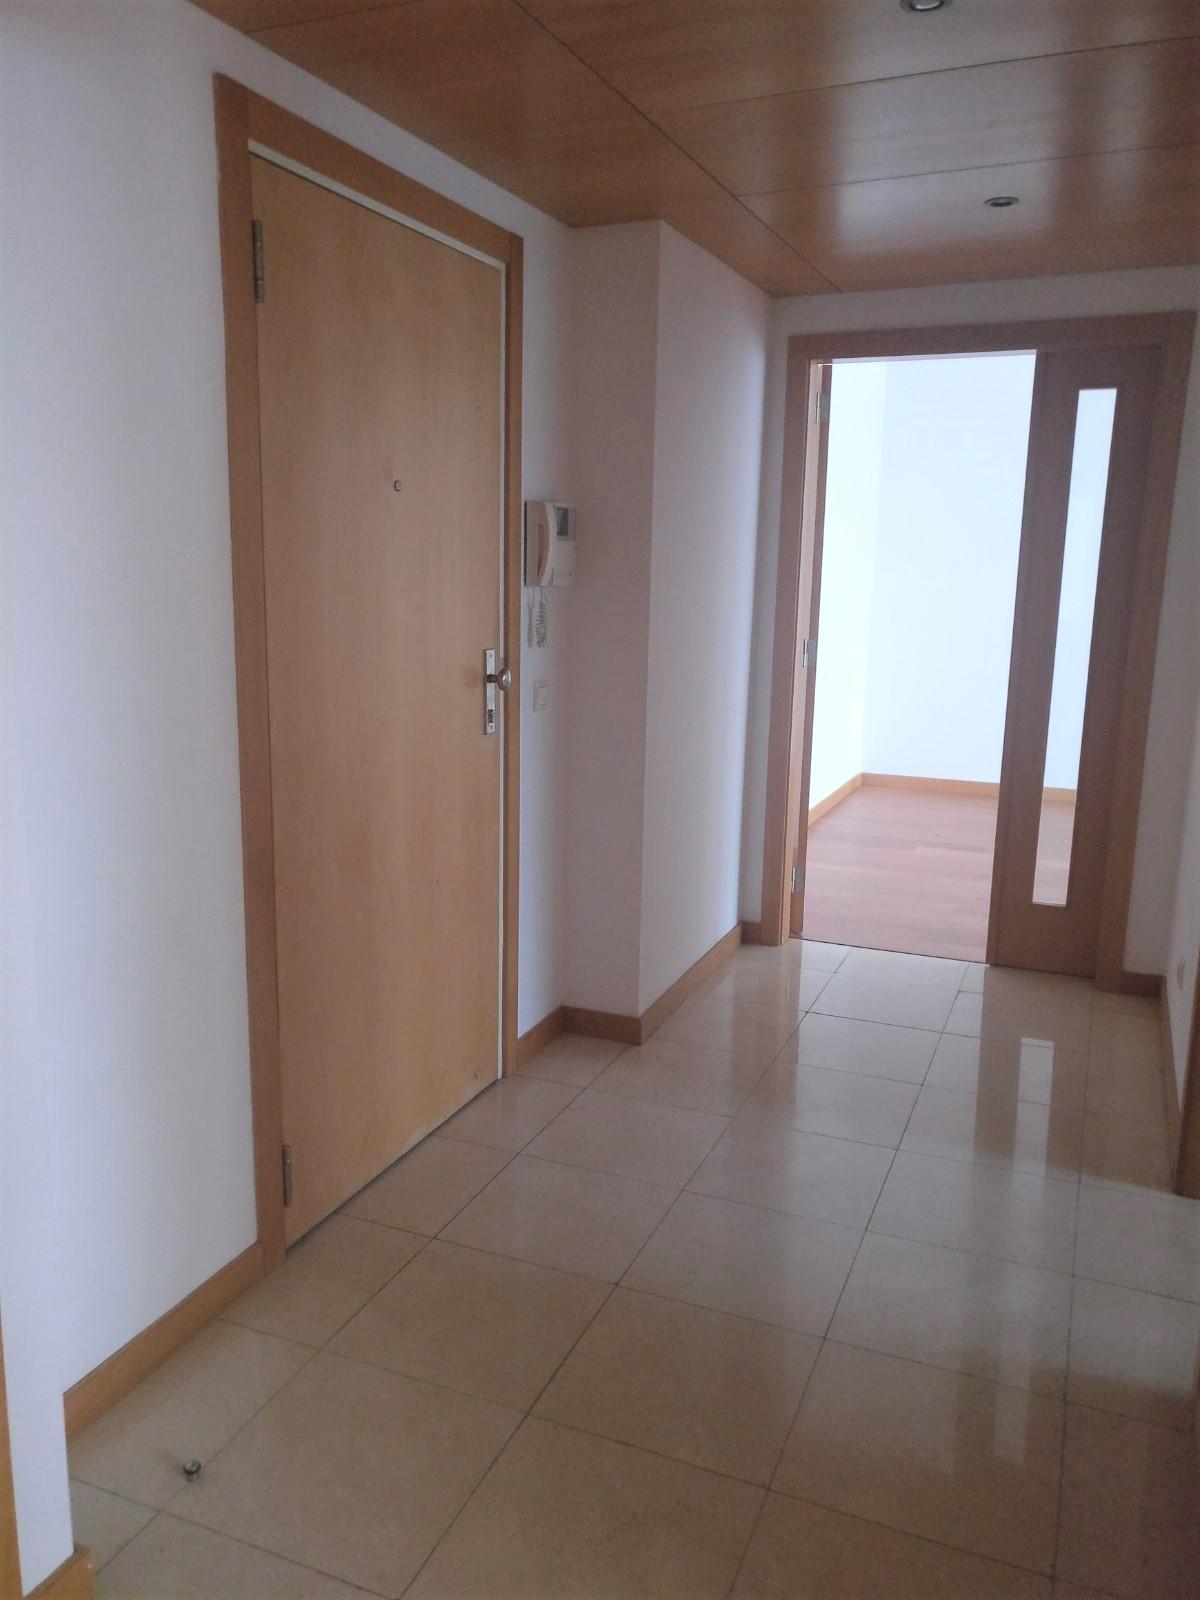 Apartamentos T1 - Lisboa, Santa Maria dos Olivais (Lisboa)